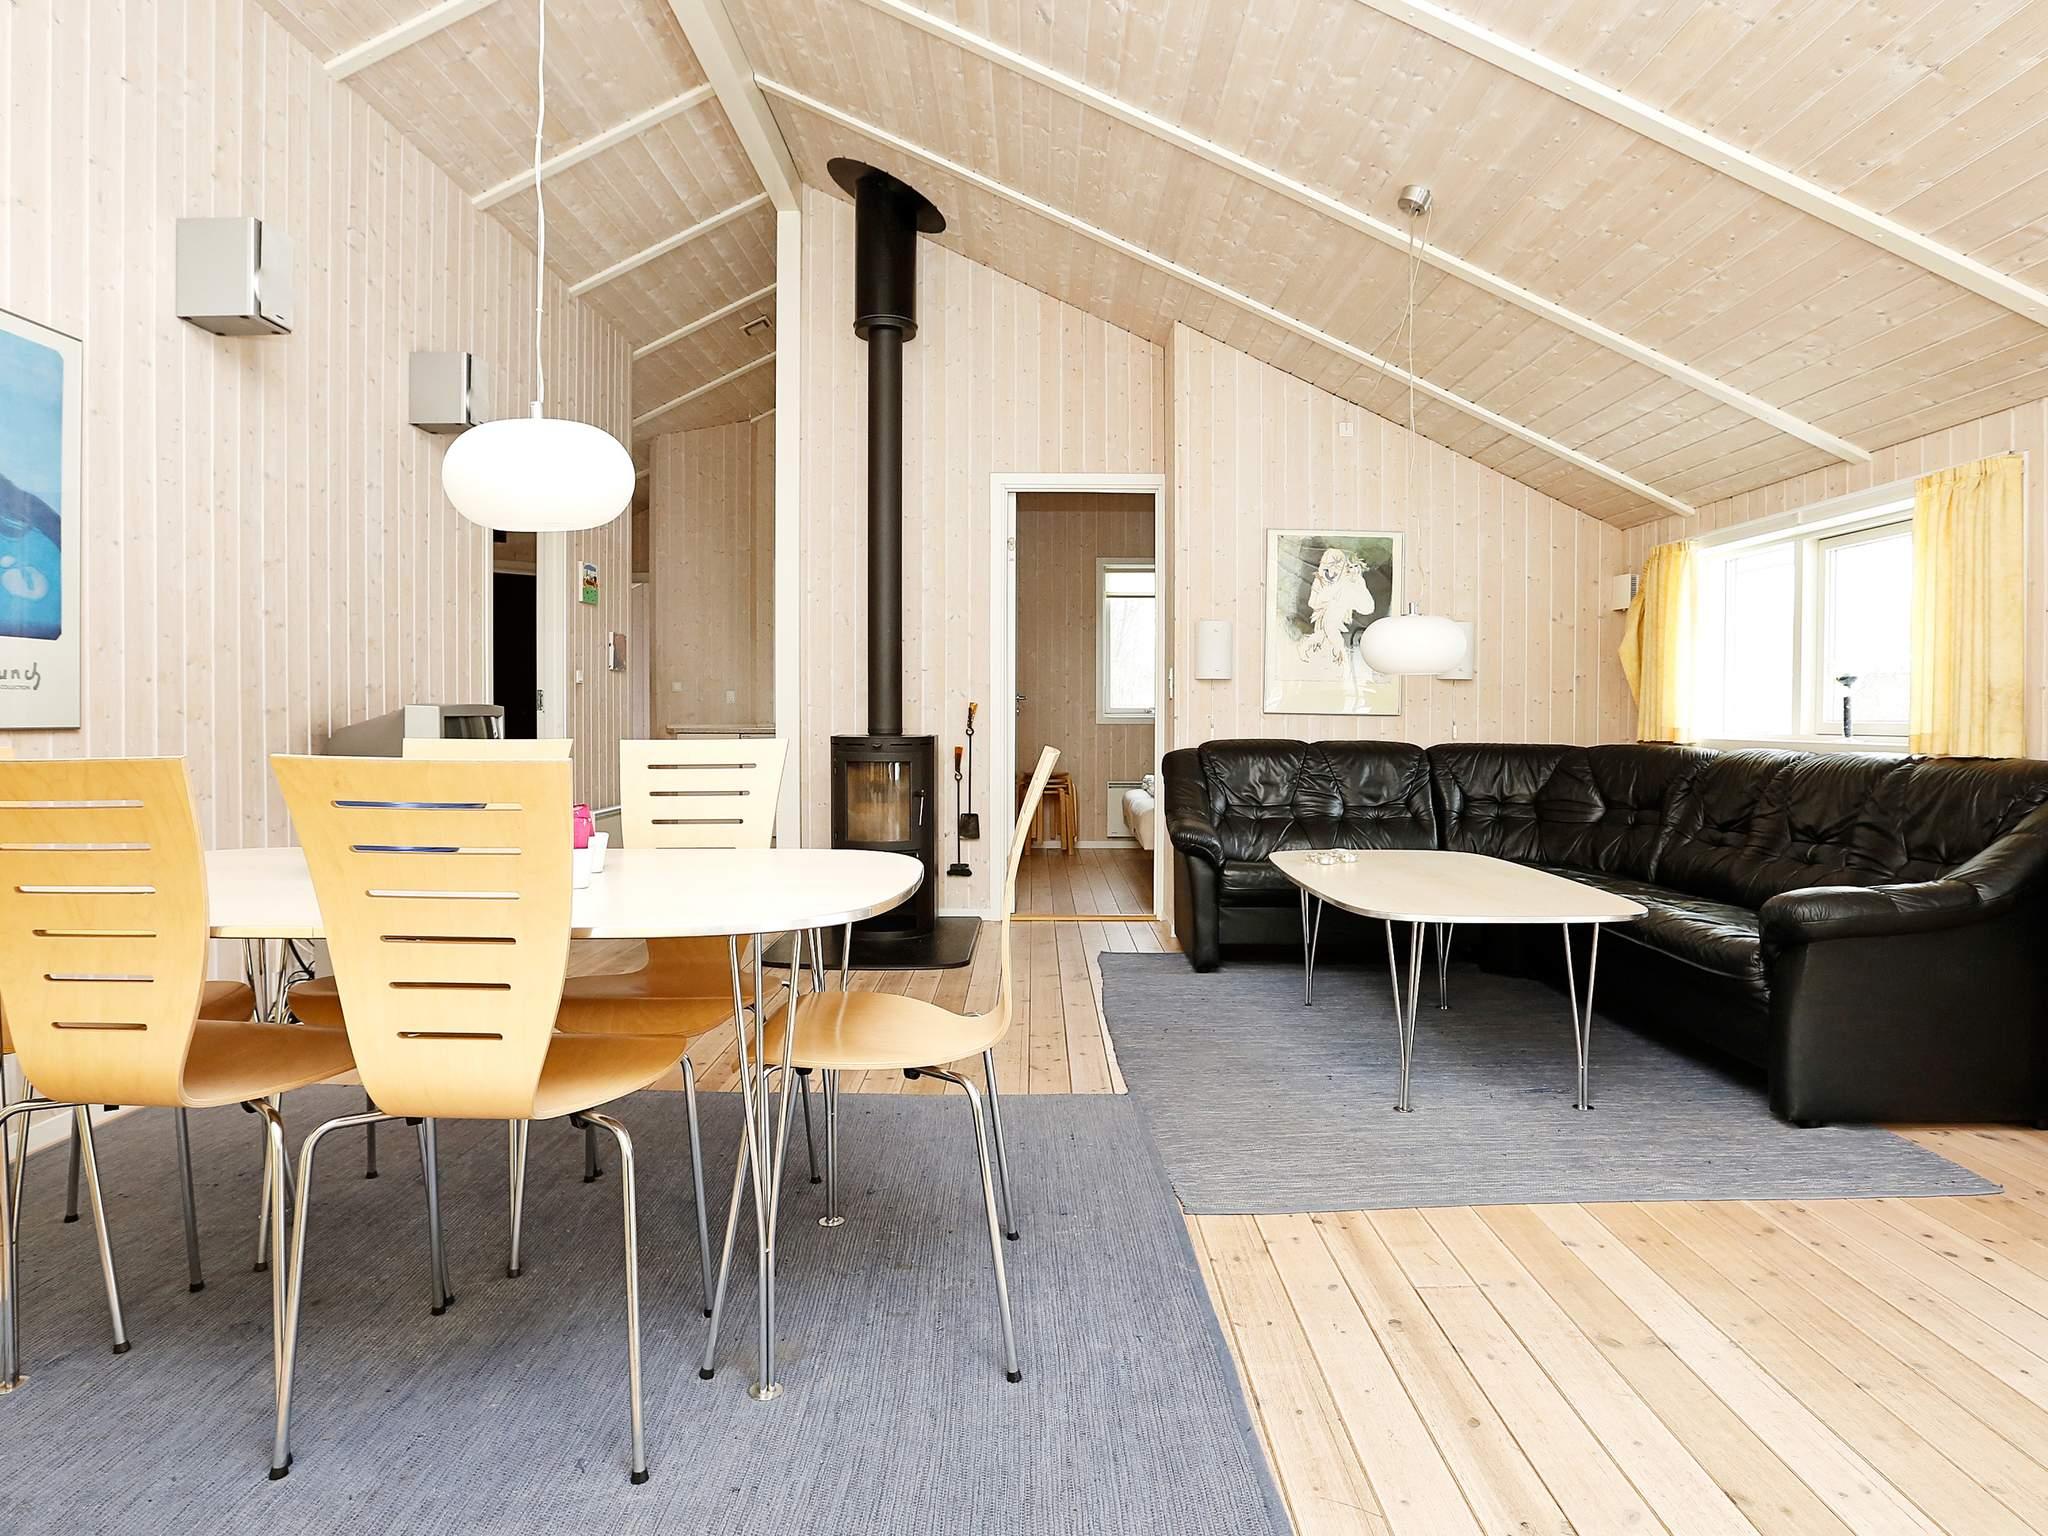 Ferienhaus Smidstrup Strand (86601), Smidstrup, , Nordseeland, Dänemark, Bild 2